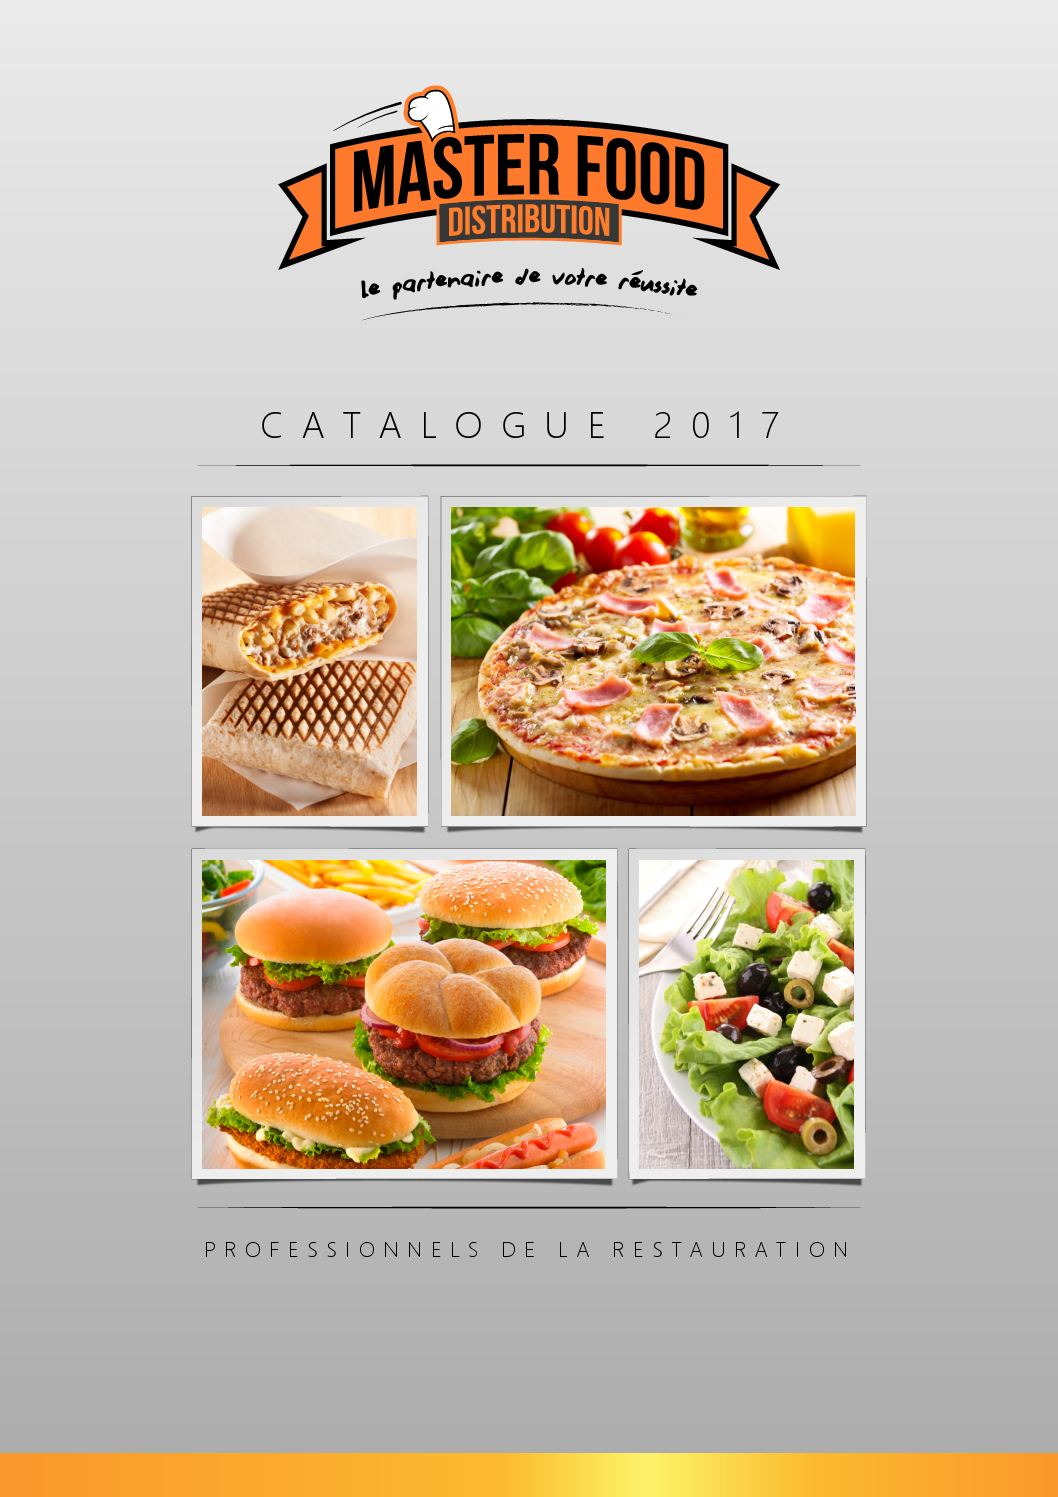 Catalogue Master Food Distribution 2017